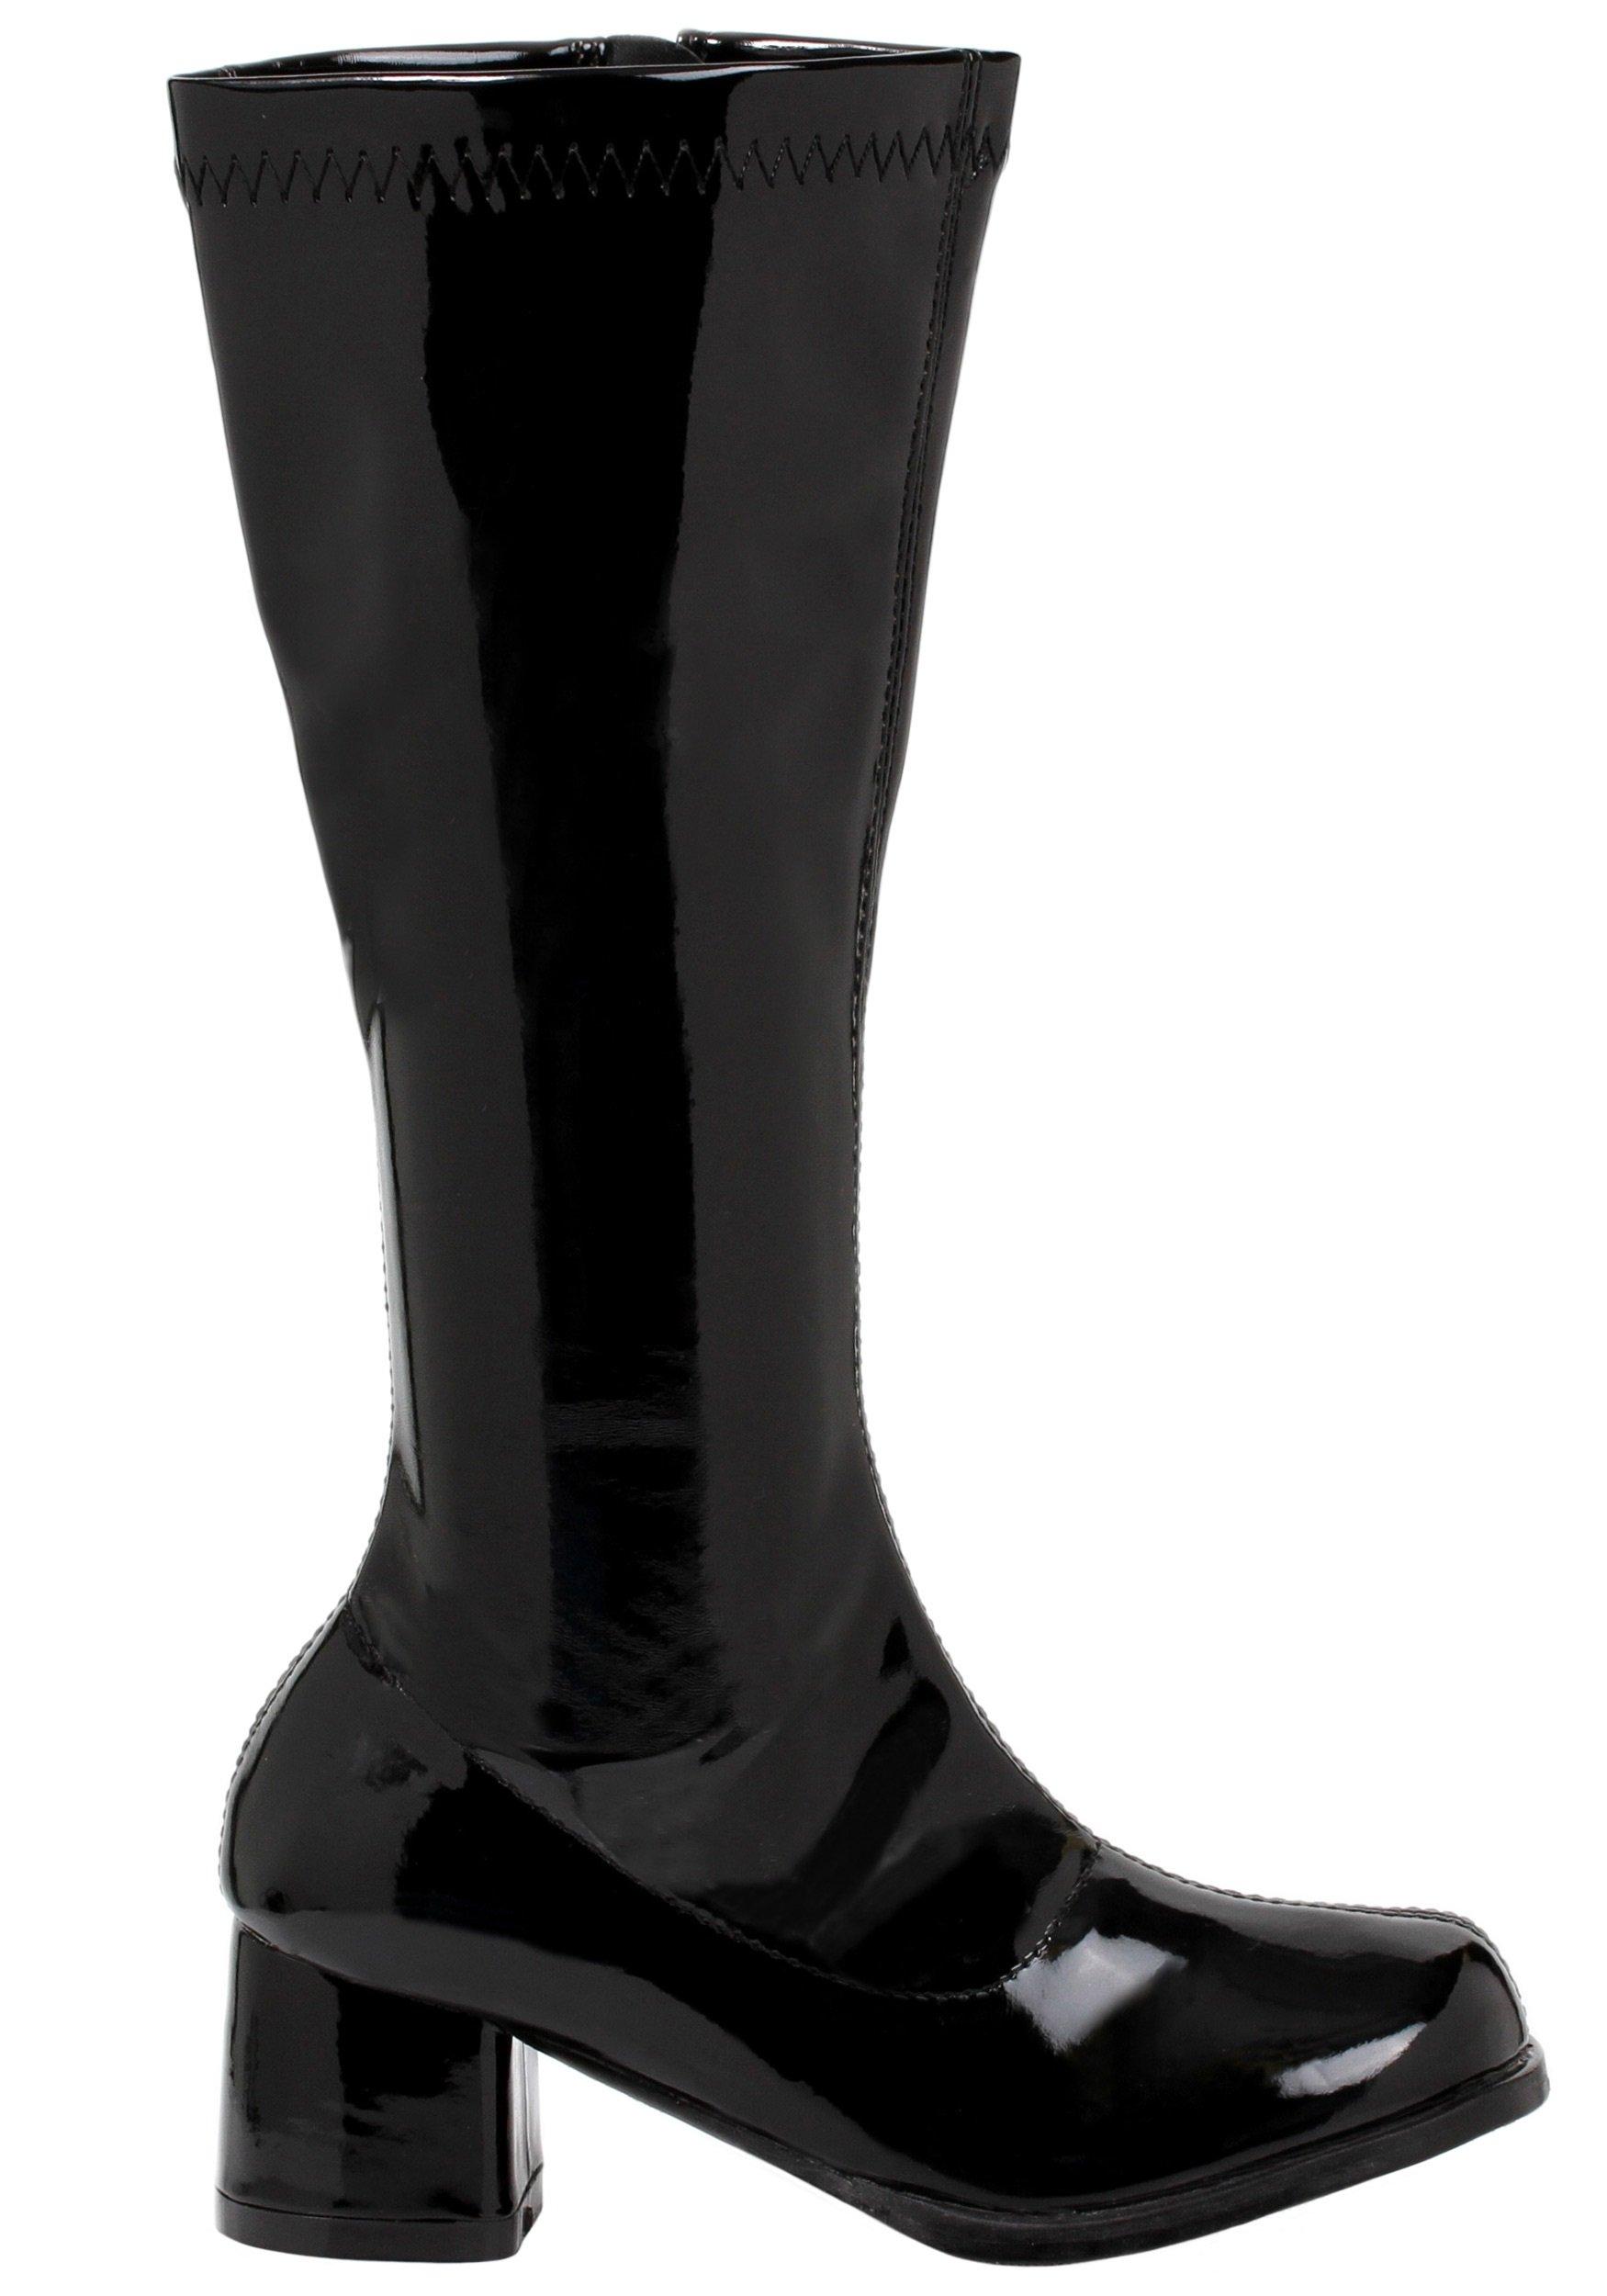 Ellie Shoes - Dora (Black) Child Boots - Small (11-12) - Black